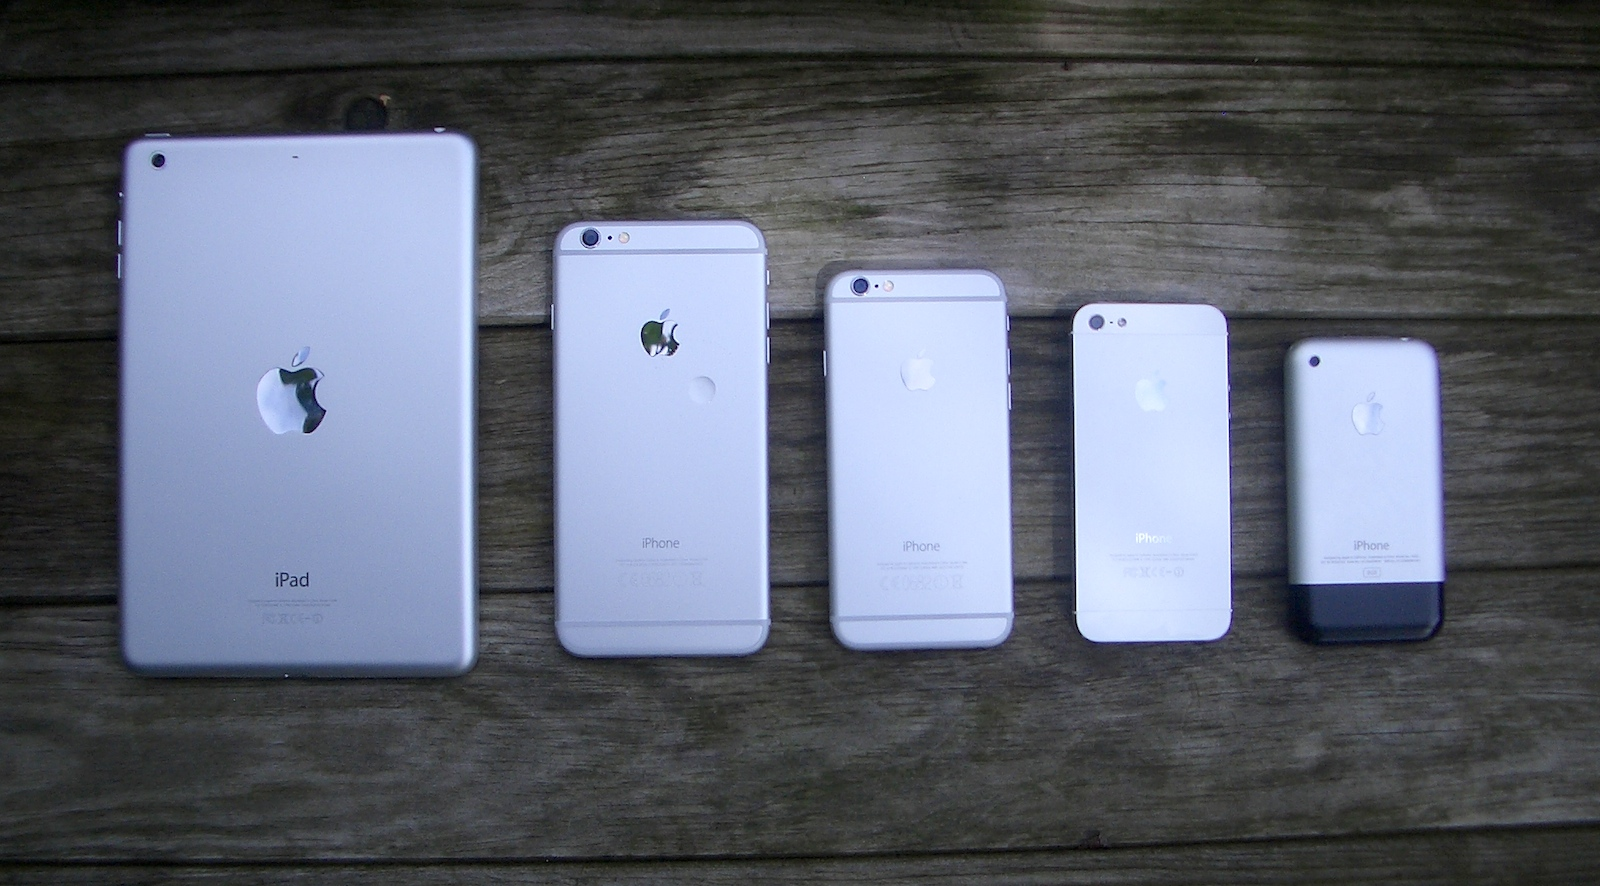 acheter iphone reconditionne avis